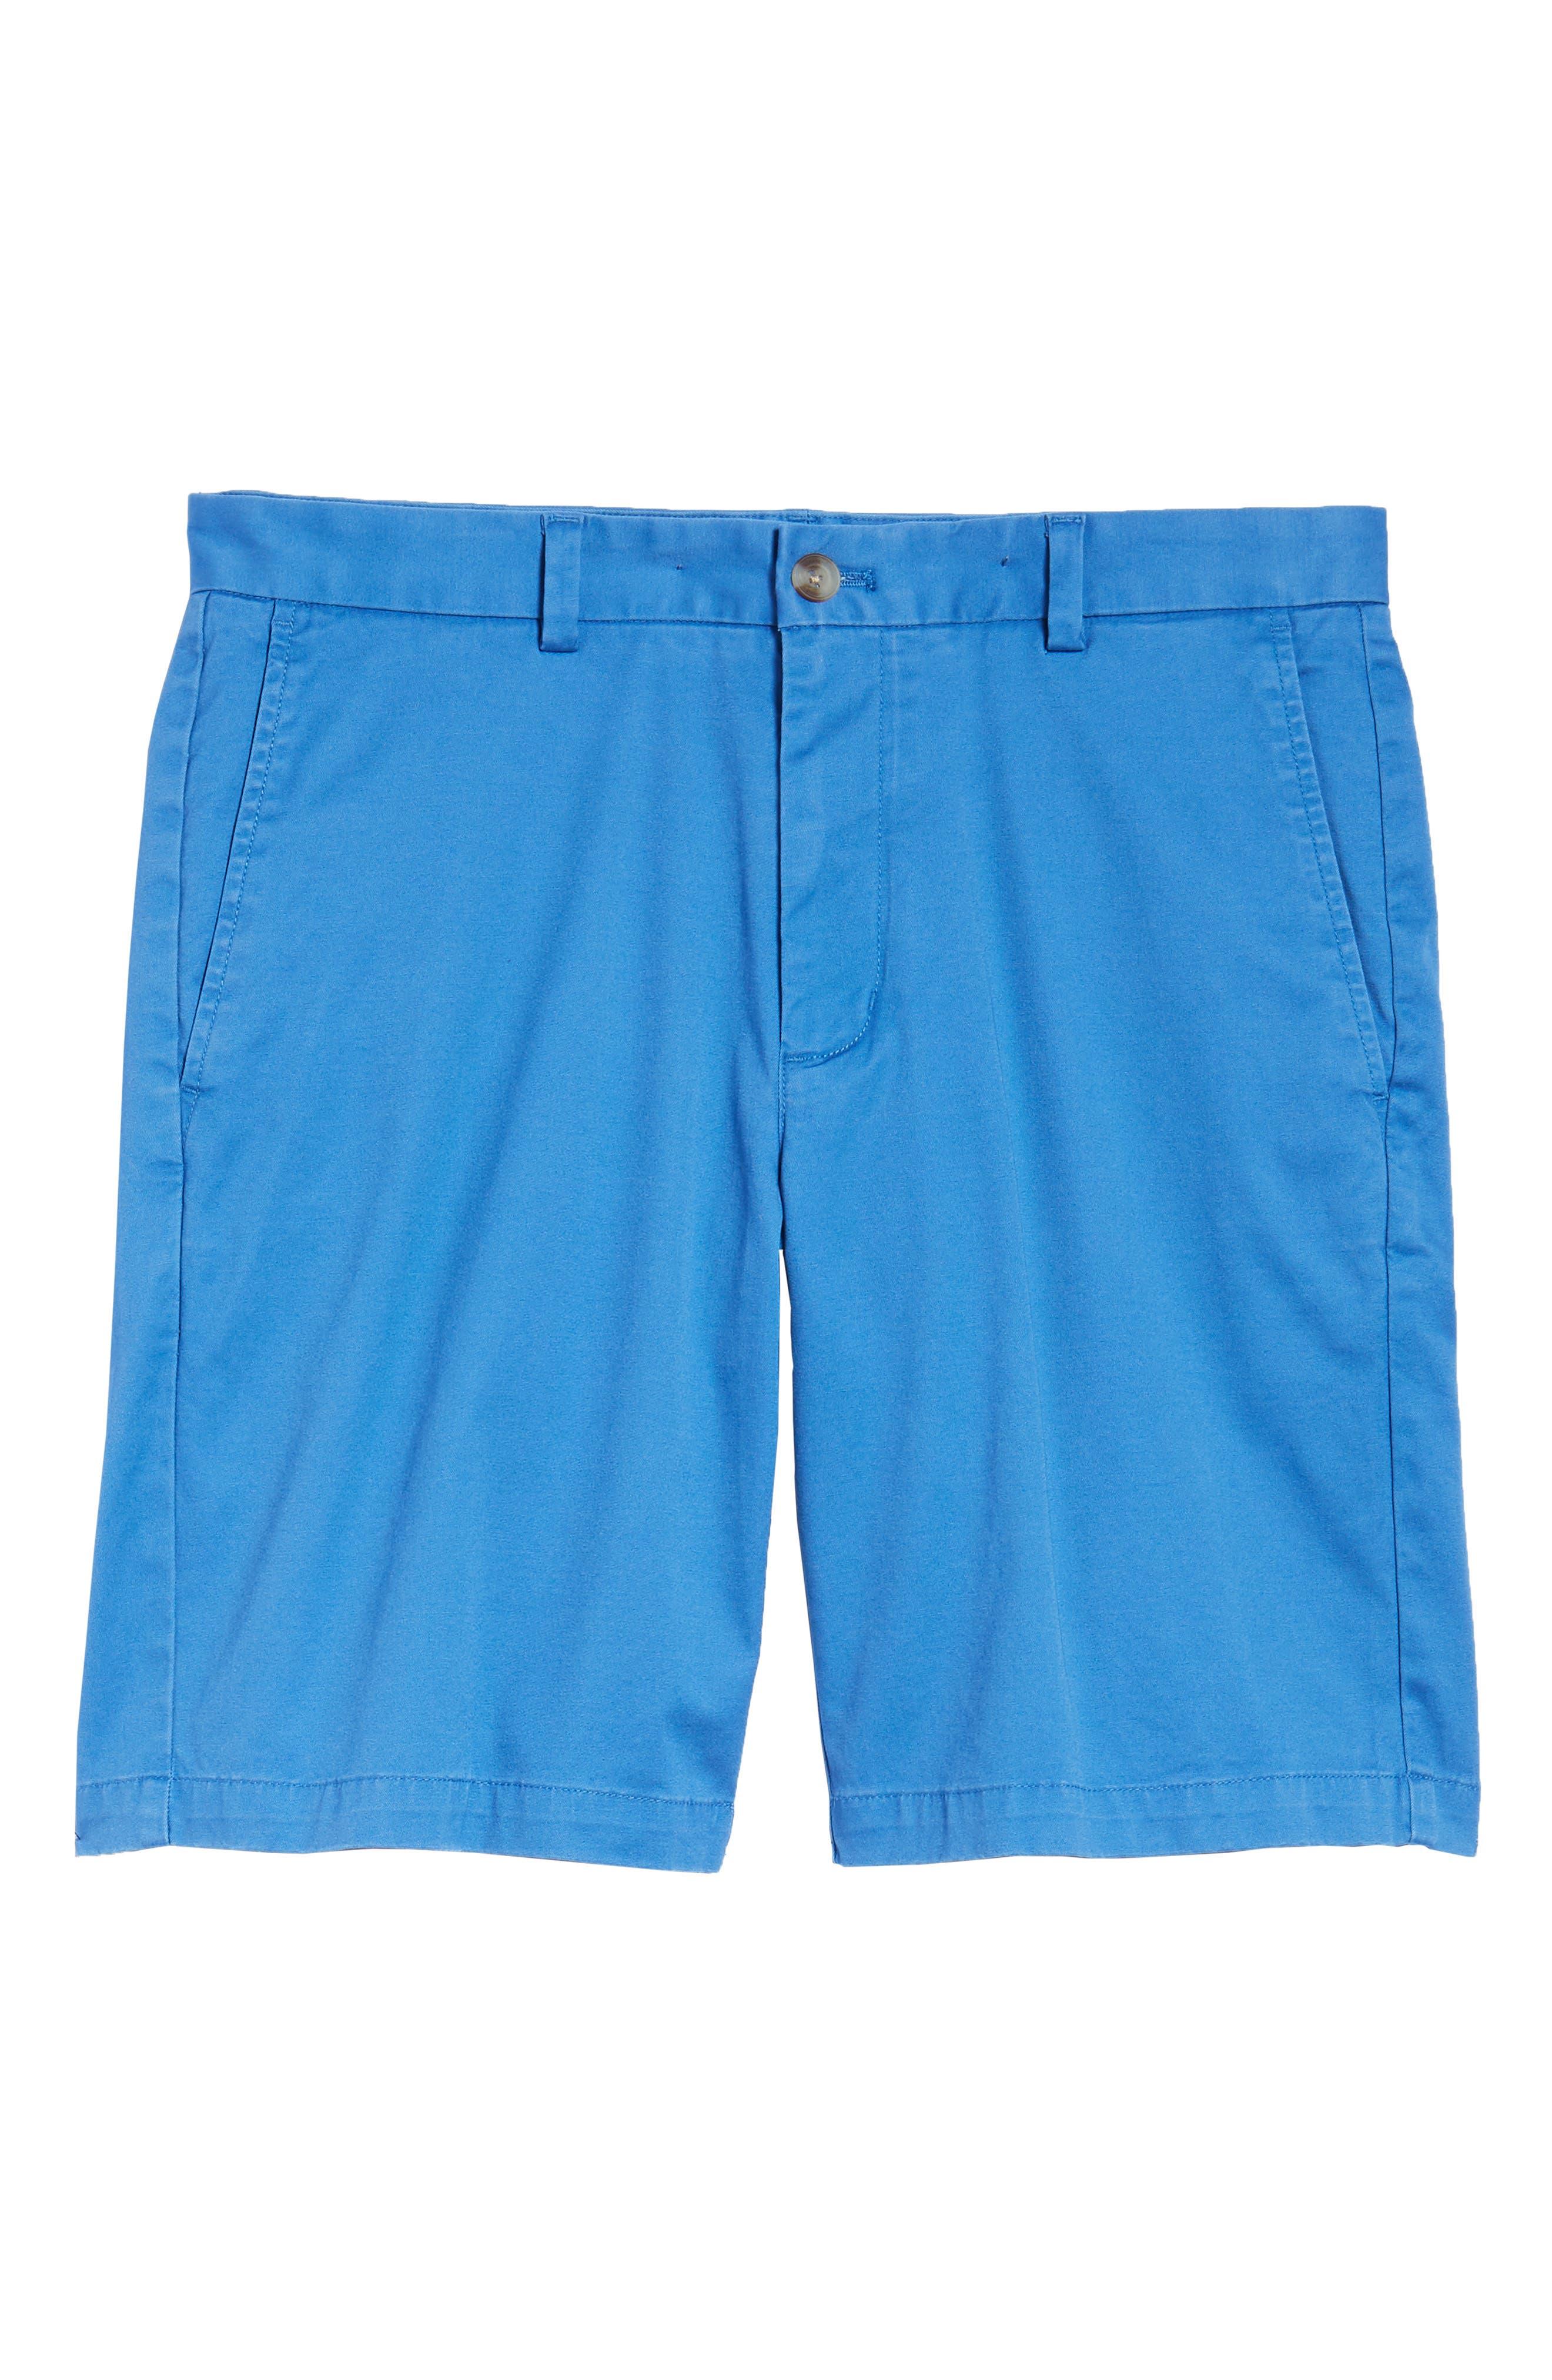 9 Inch Stretch Breaker Shorts,                             Alternate thumbnail 118, color,